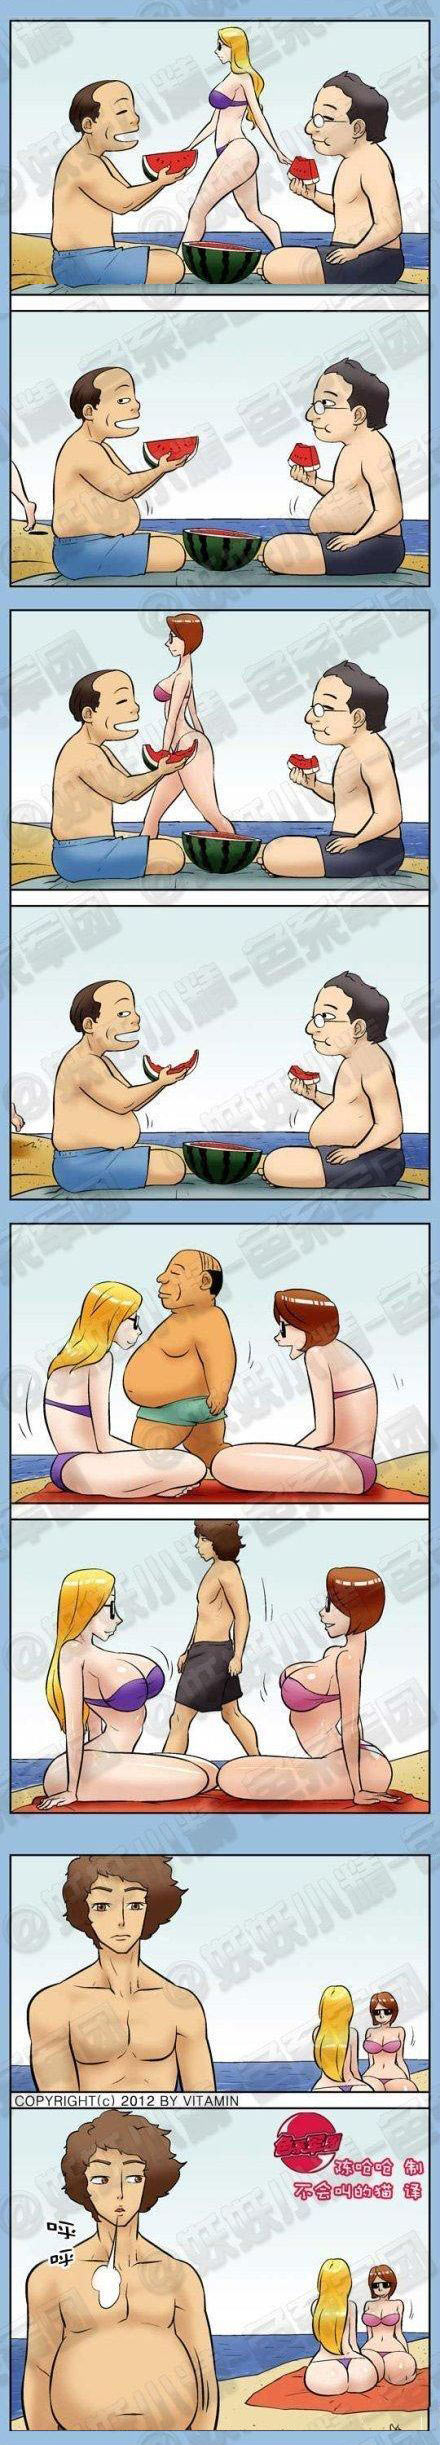 funny-men-fat-thin-women-bellies